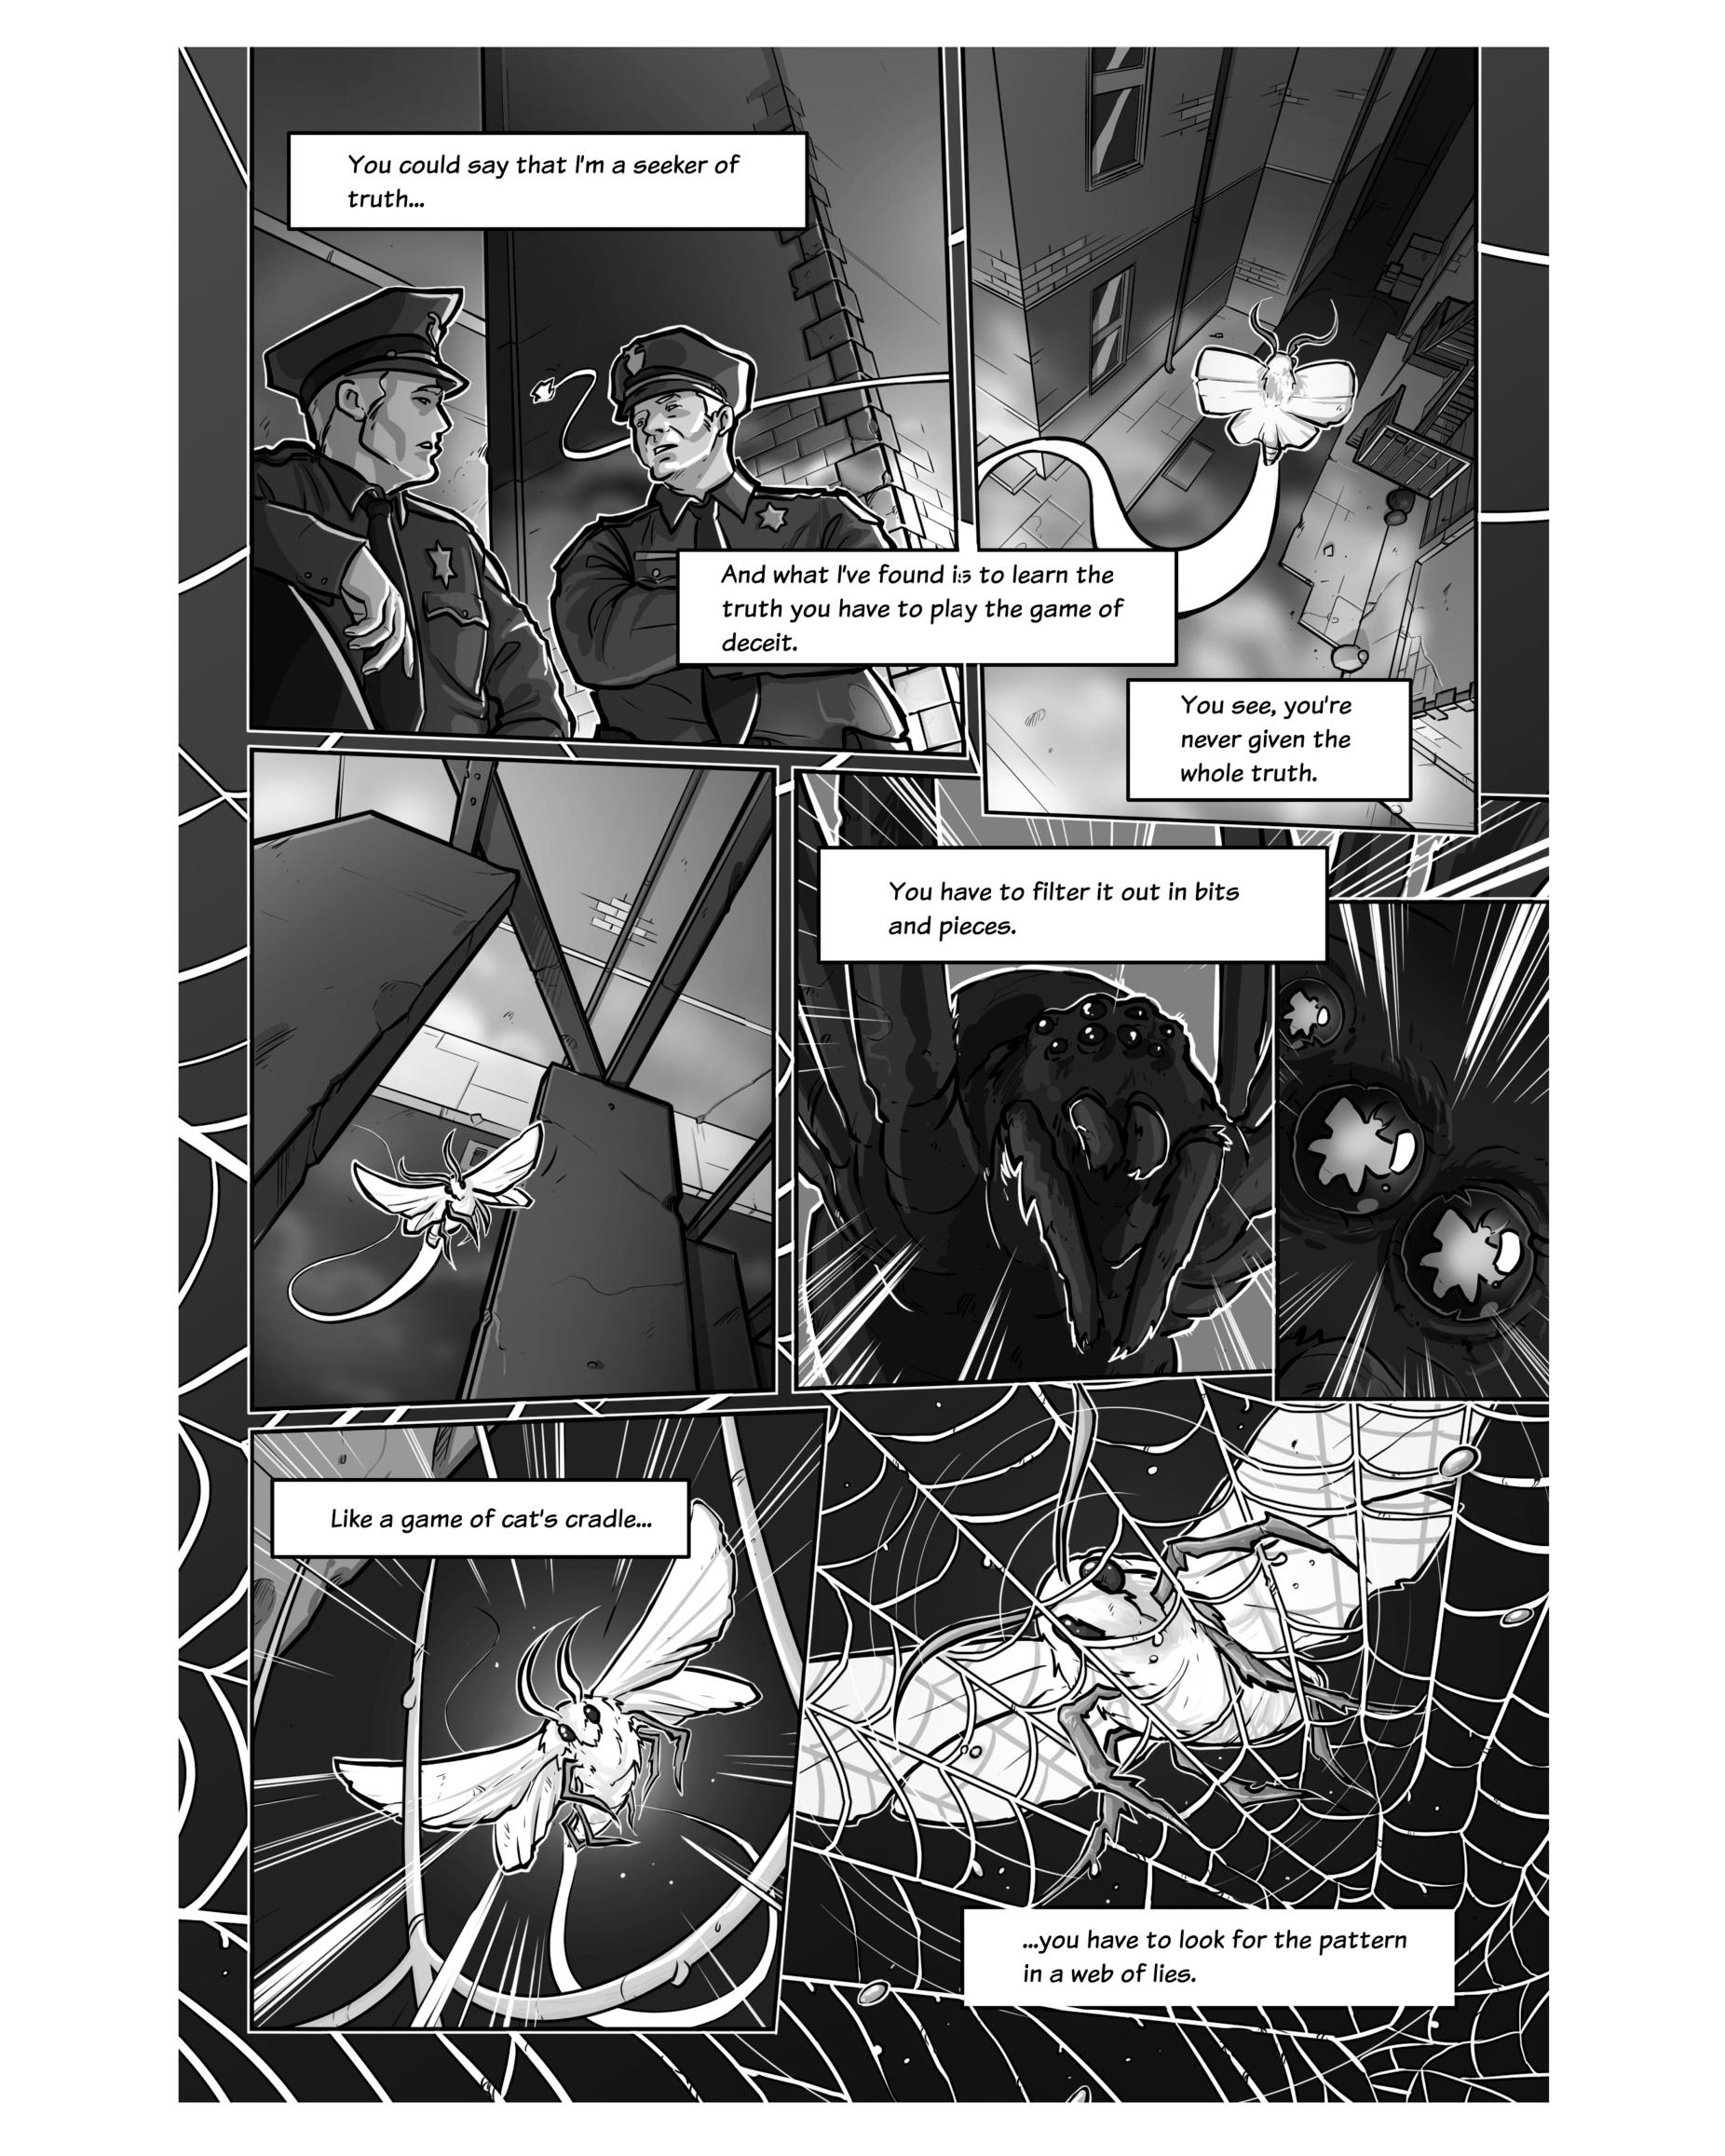 owatw_1+PAGE+2+WEB.jpg